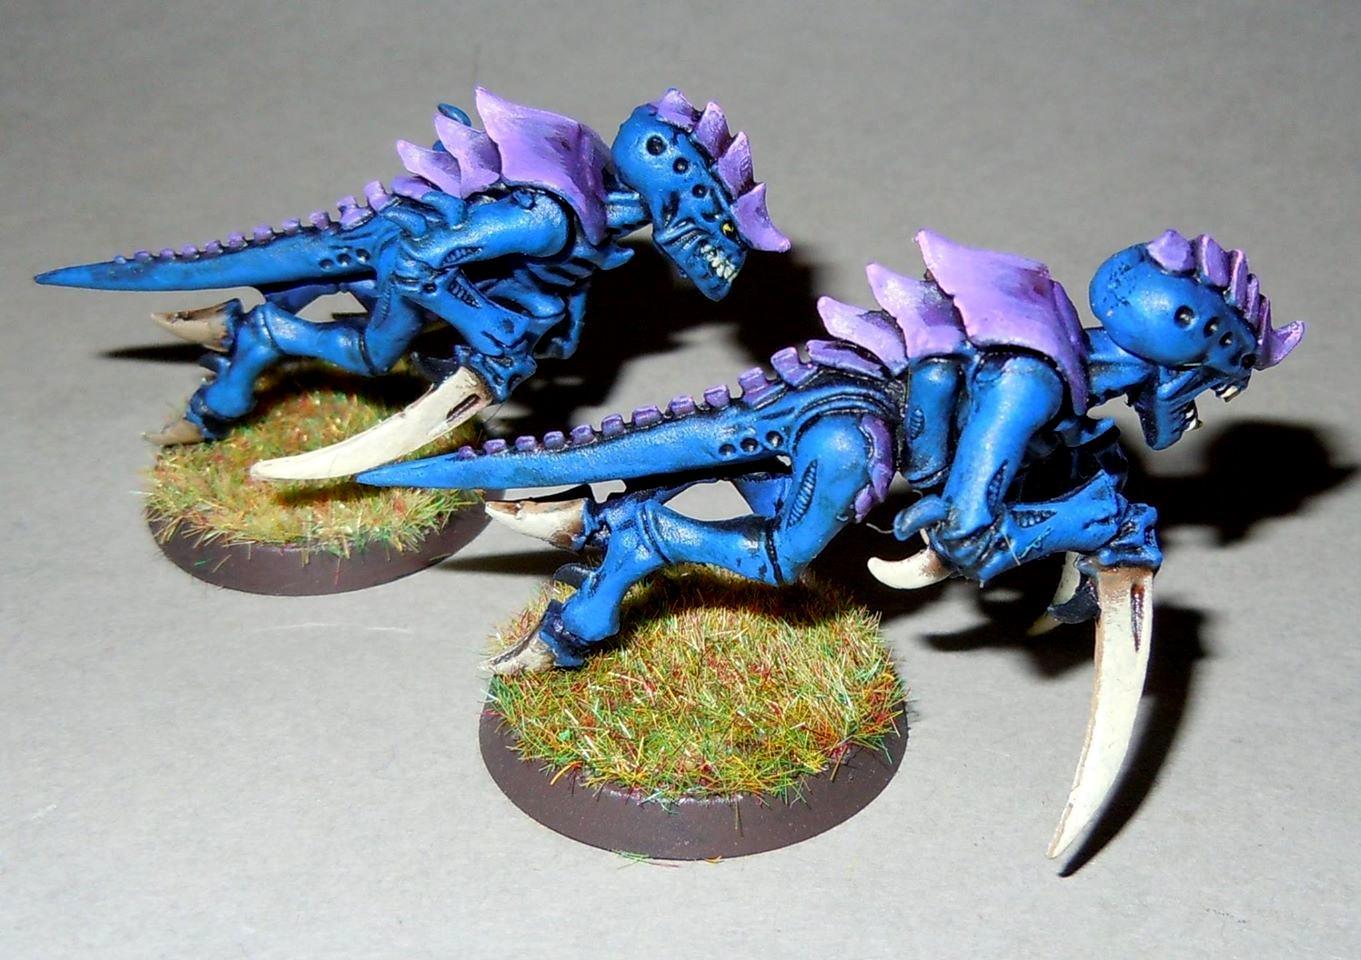 Blue, Tyranids, Hormagaunts